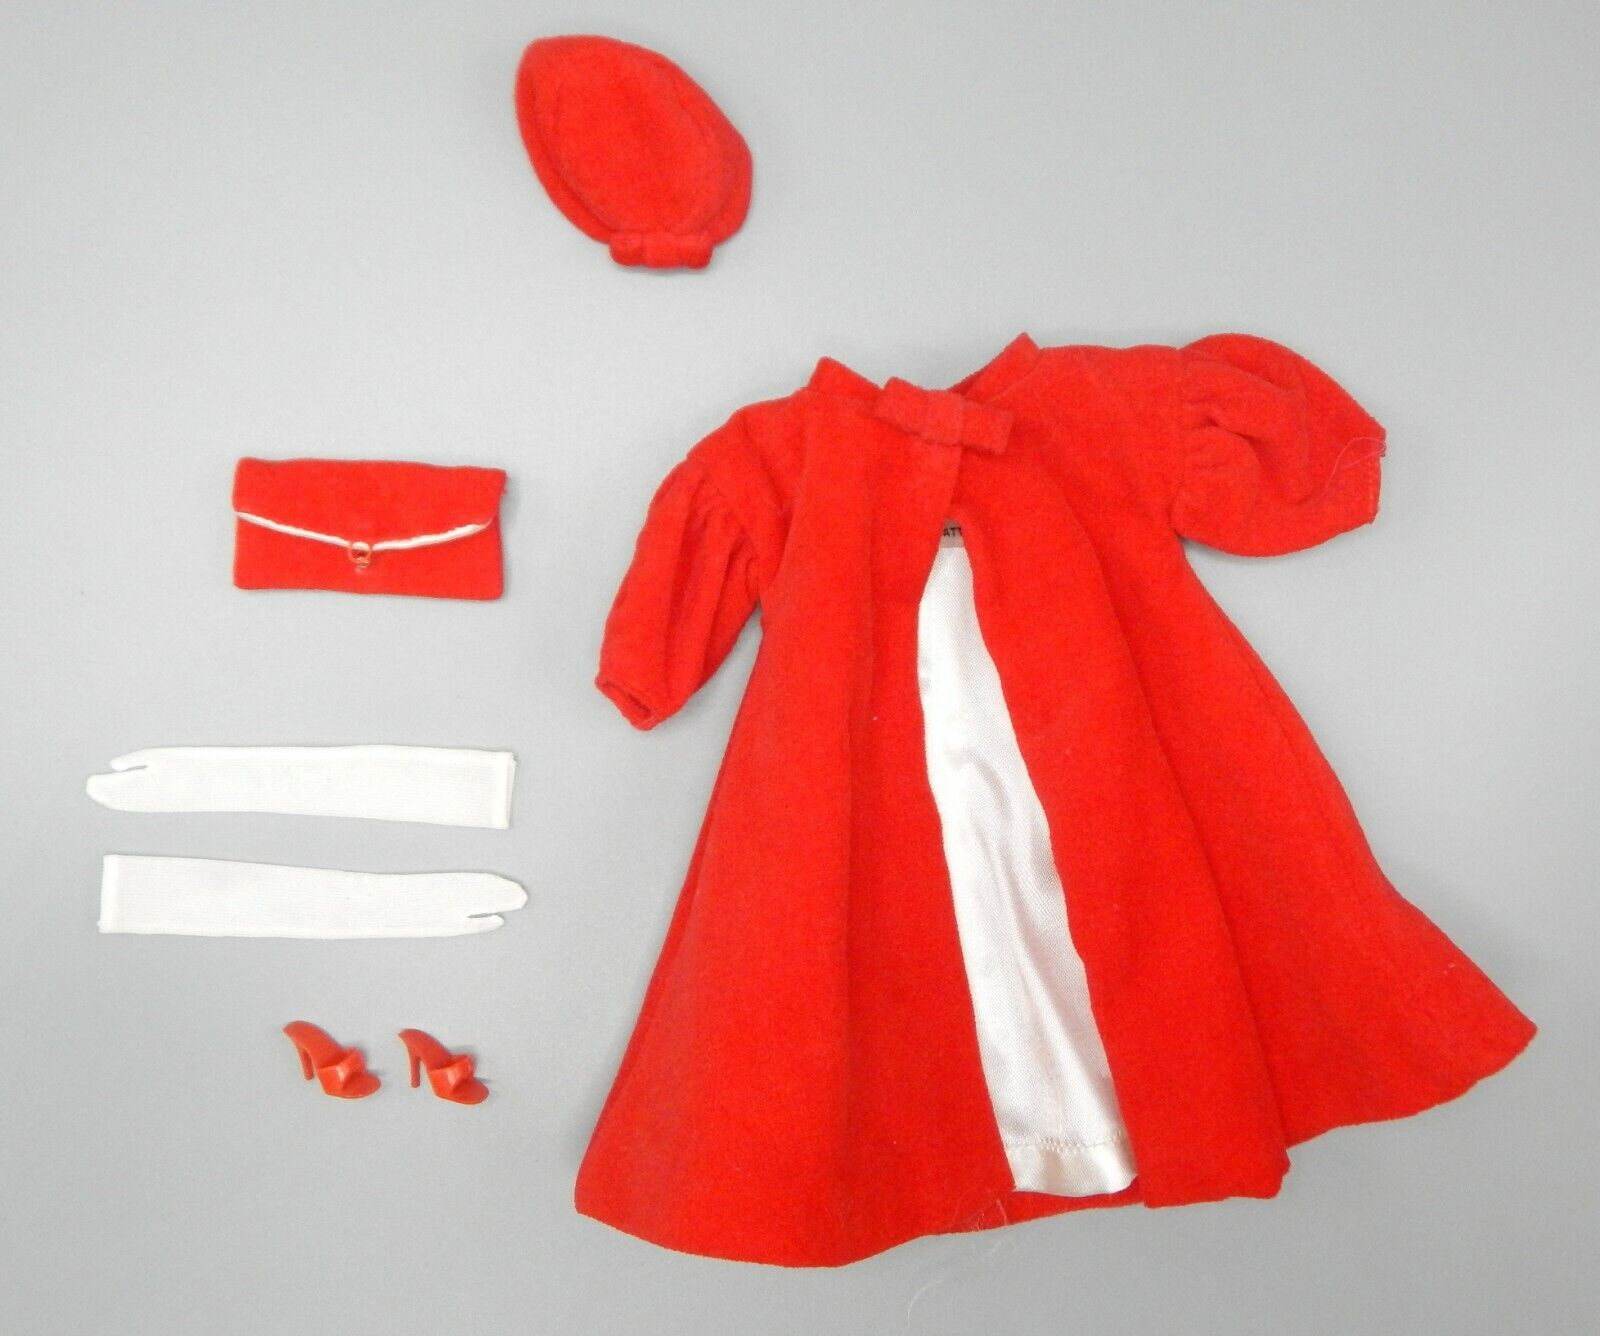 1962-1965 Jahr Mattel Barbie rot FLARE outfit 939 complete nice original